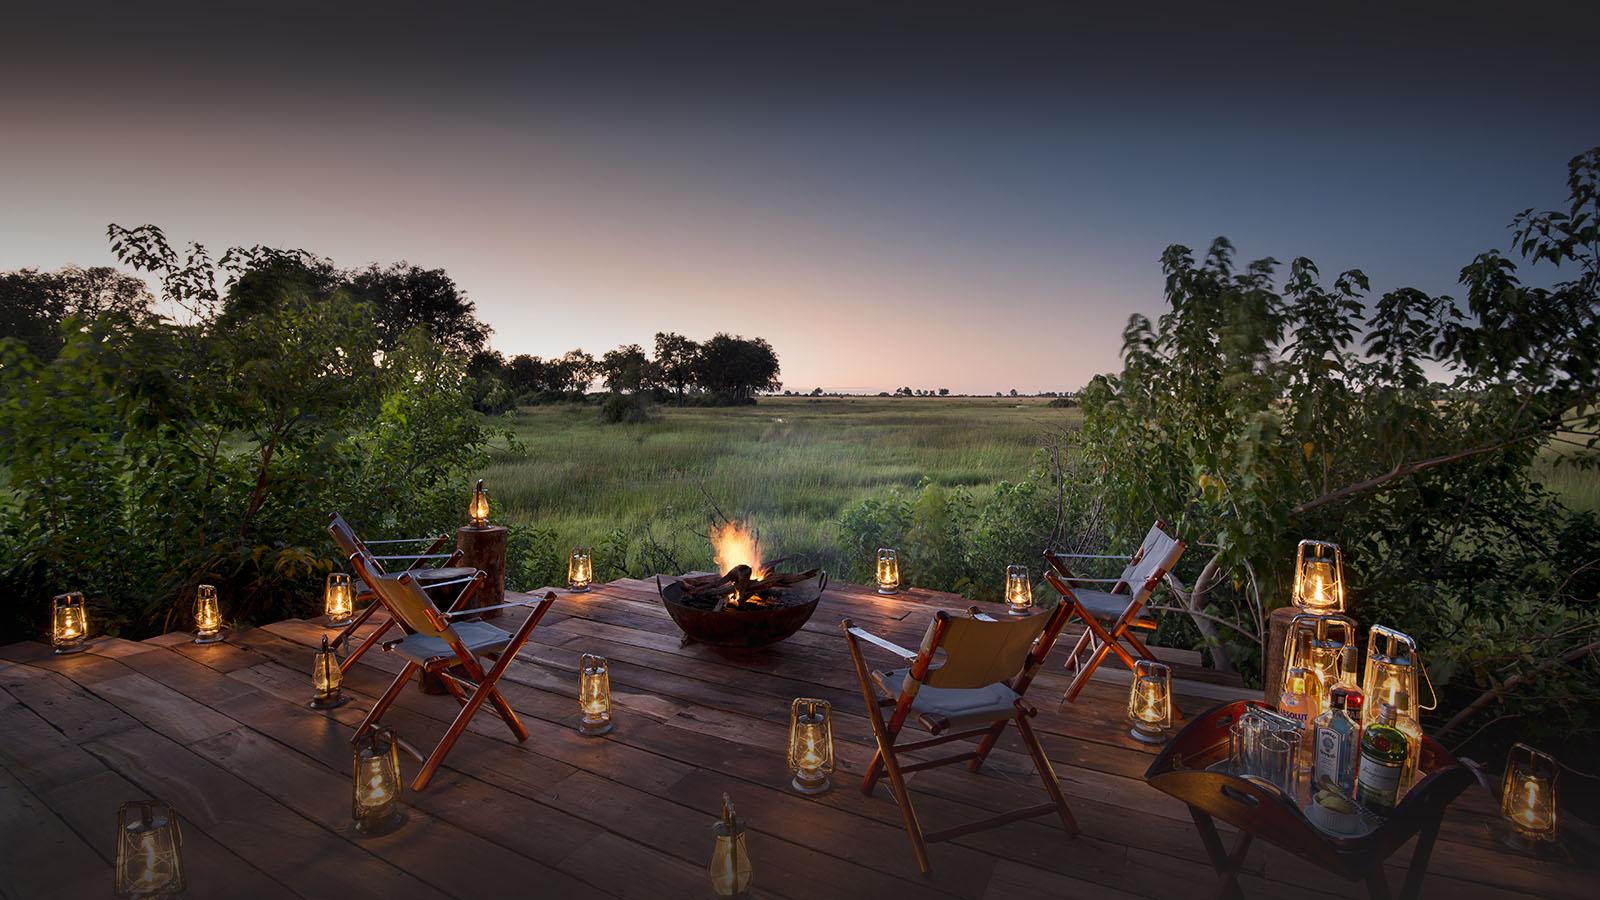 great plains duba plains camp duba-plains-suite-okavango-delta-botswana-lodges-zambia-in-style-luxury-fire-area